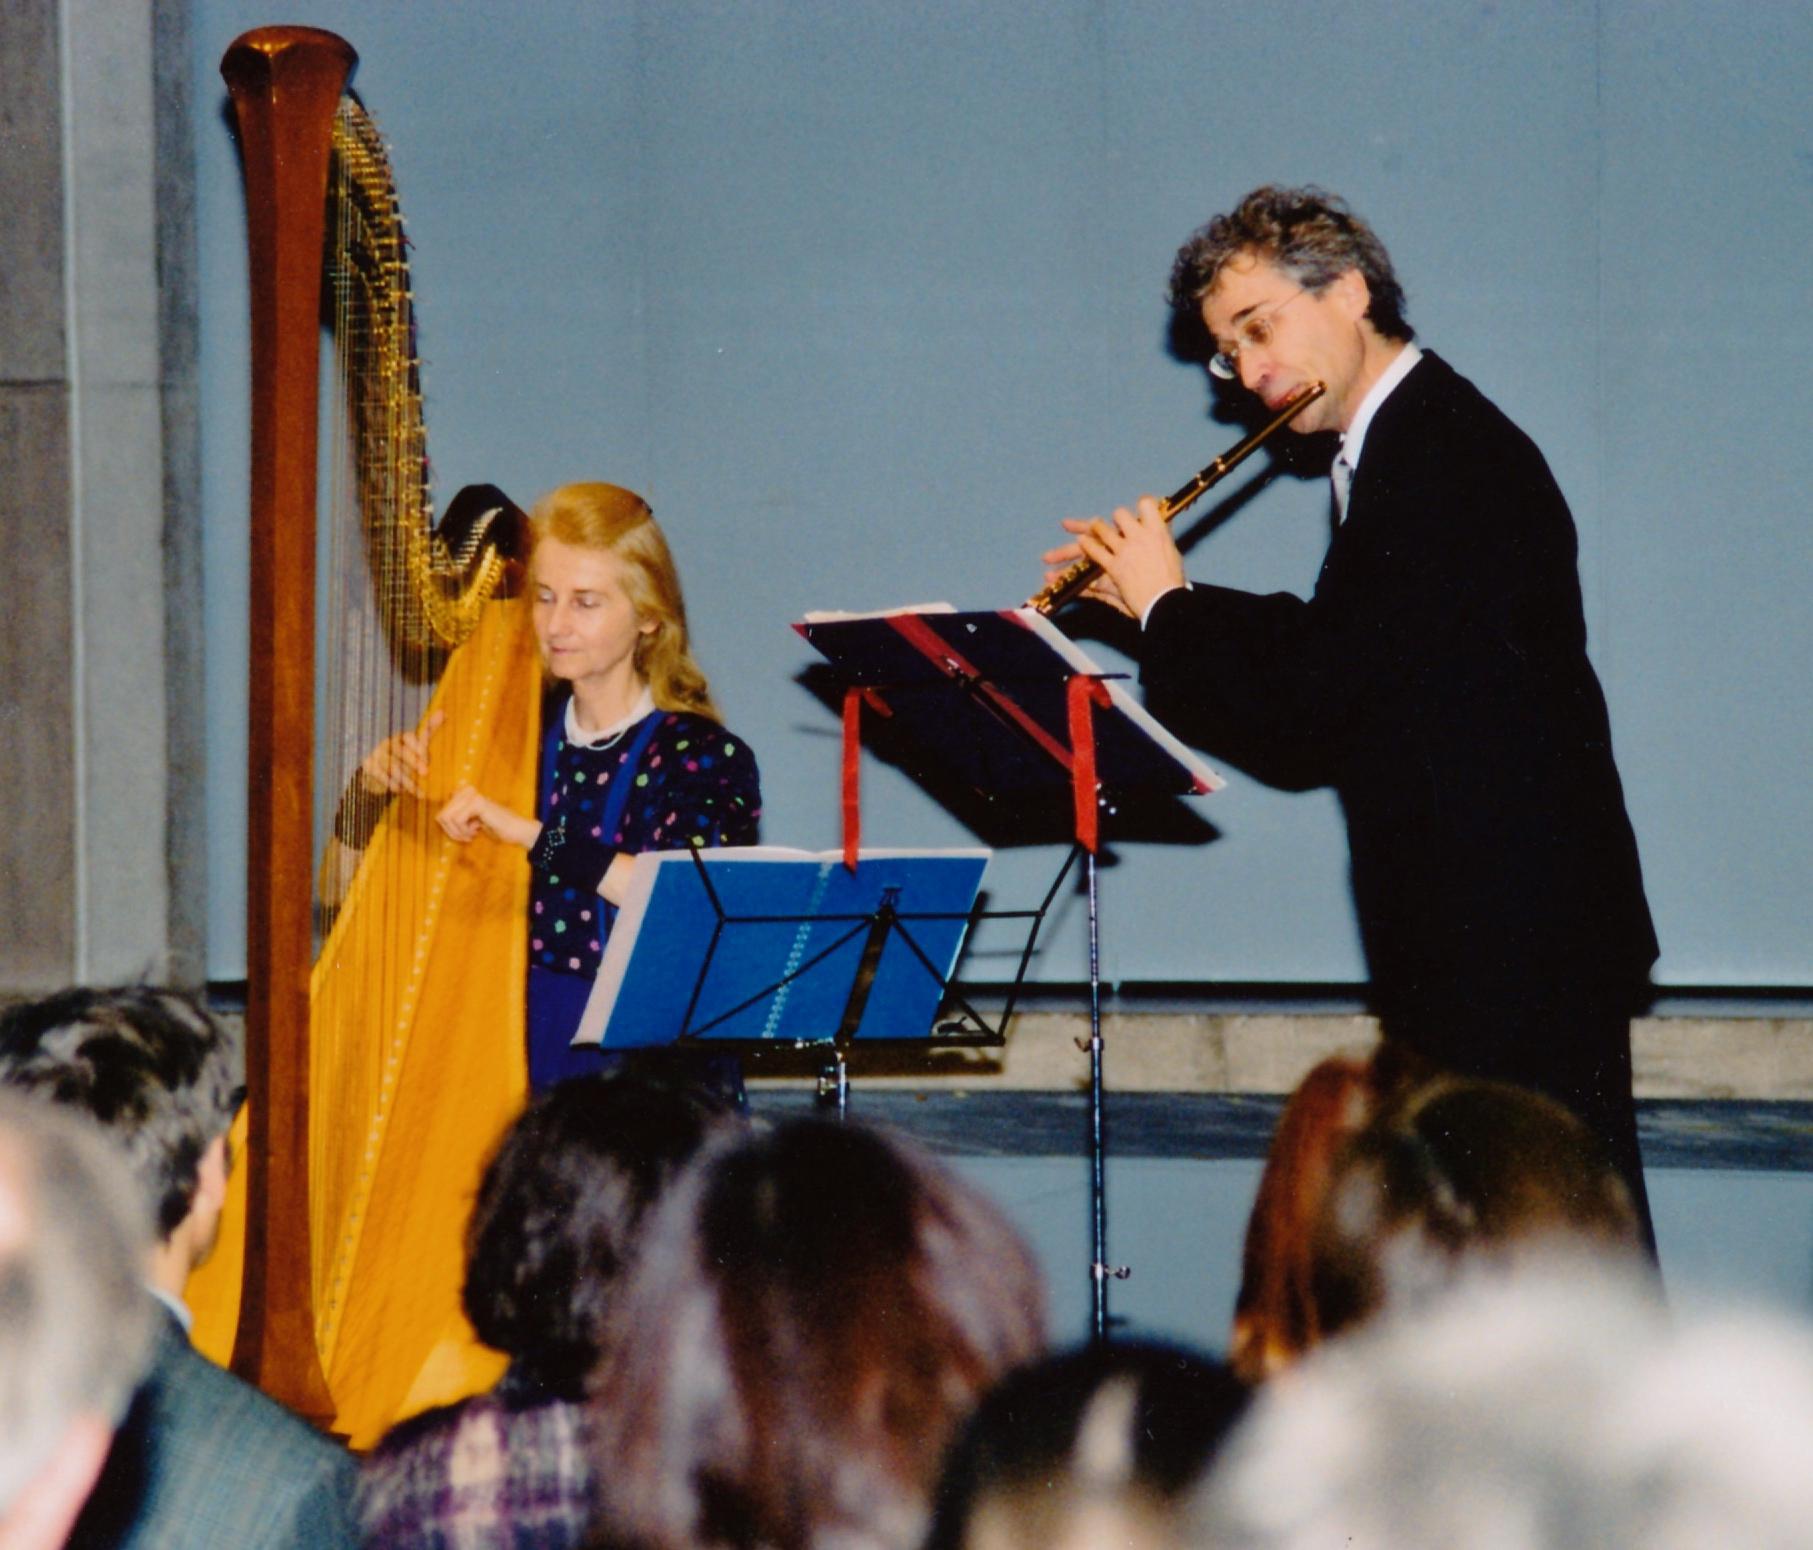 2002, with harpist Ursula Holliger (1937-2014)